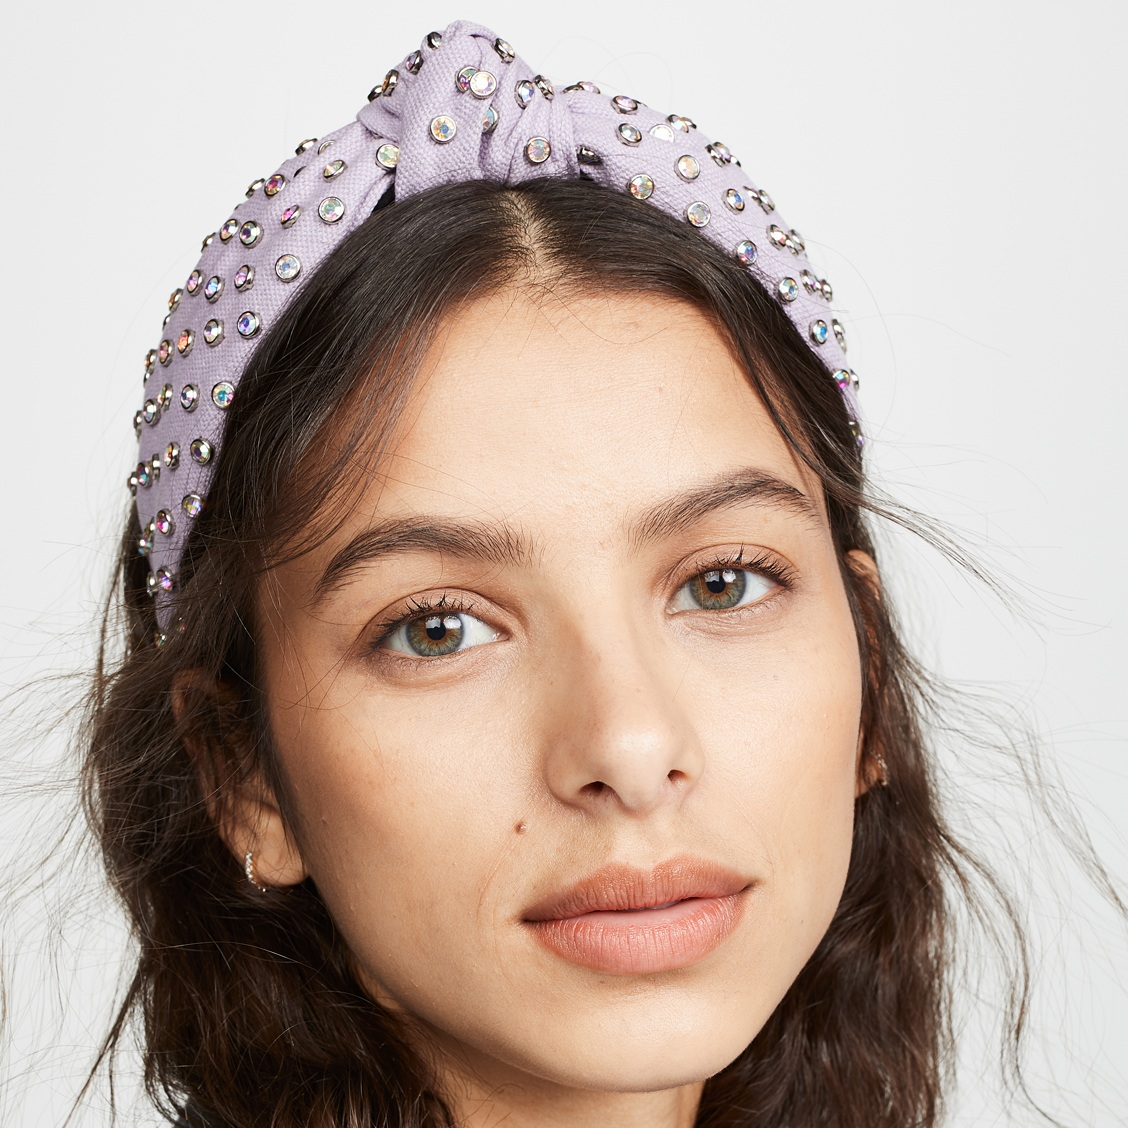 Crystal Headband - Lele Sadoughi | $170